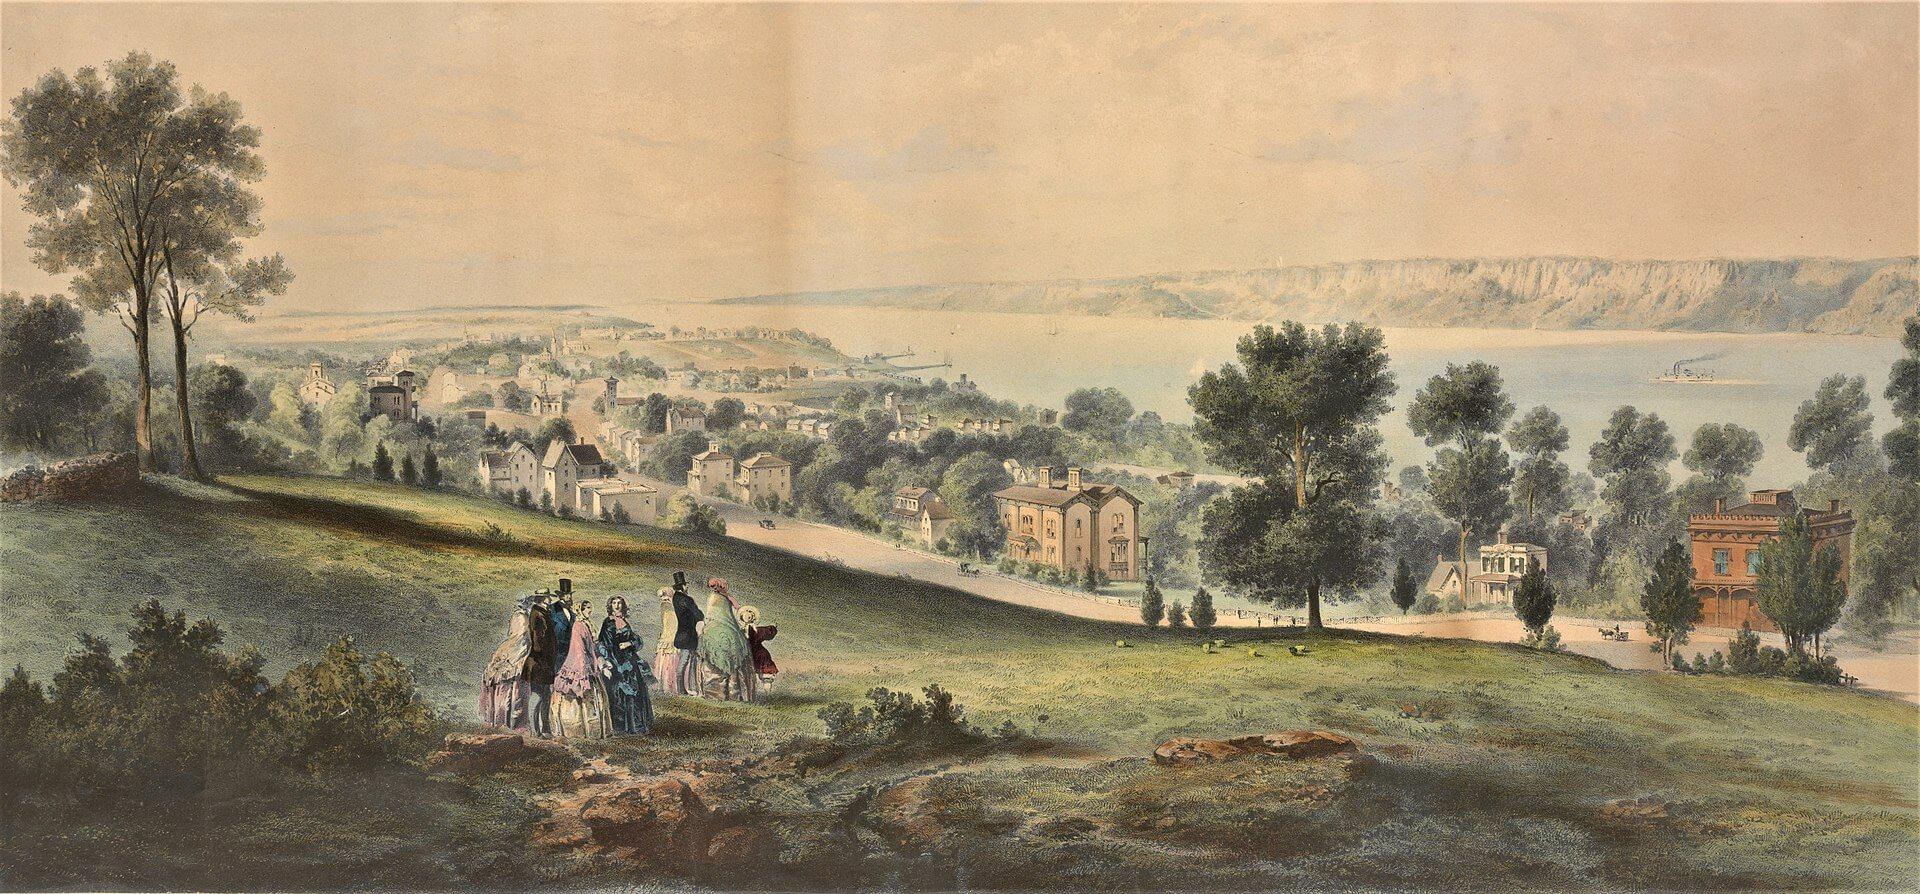 Yonkers, New York, c.1860s